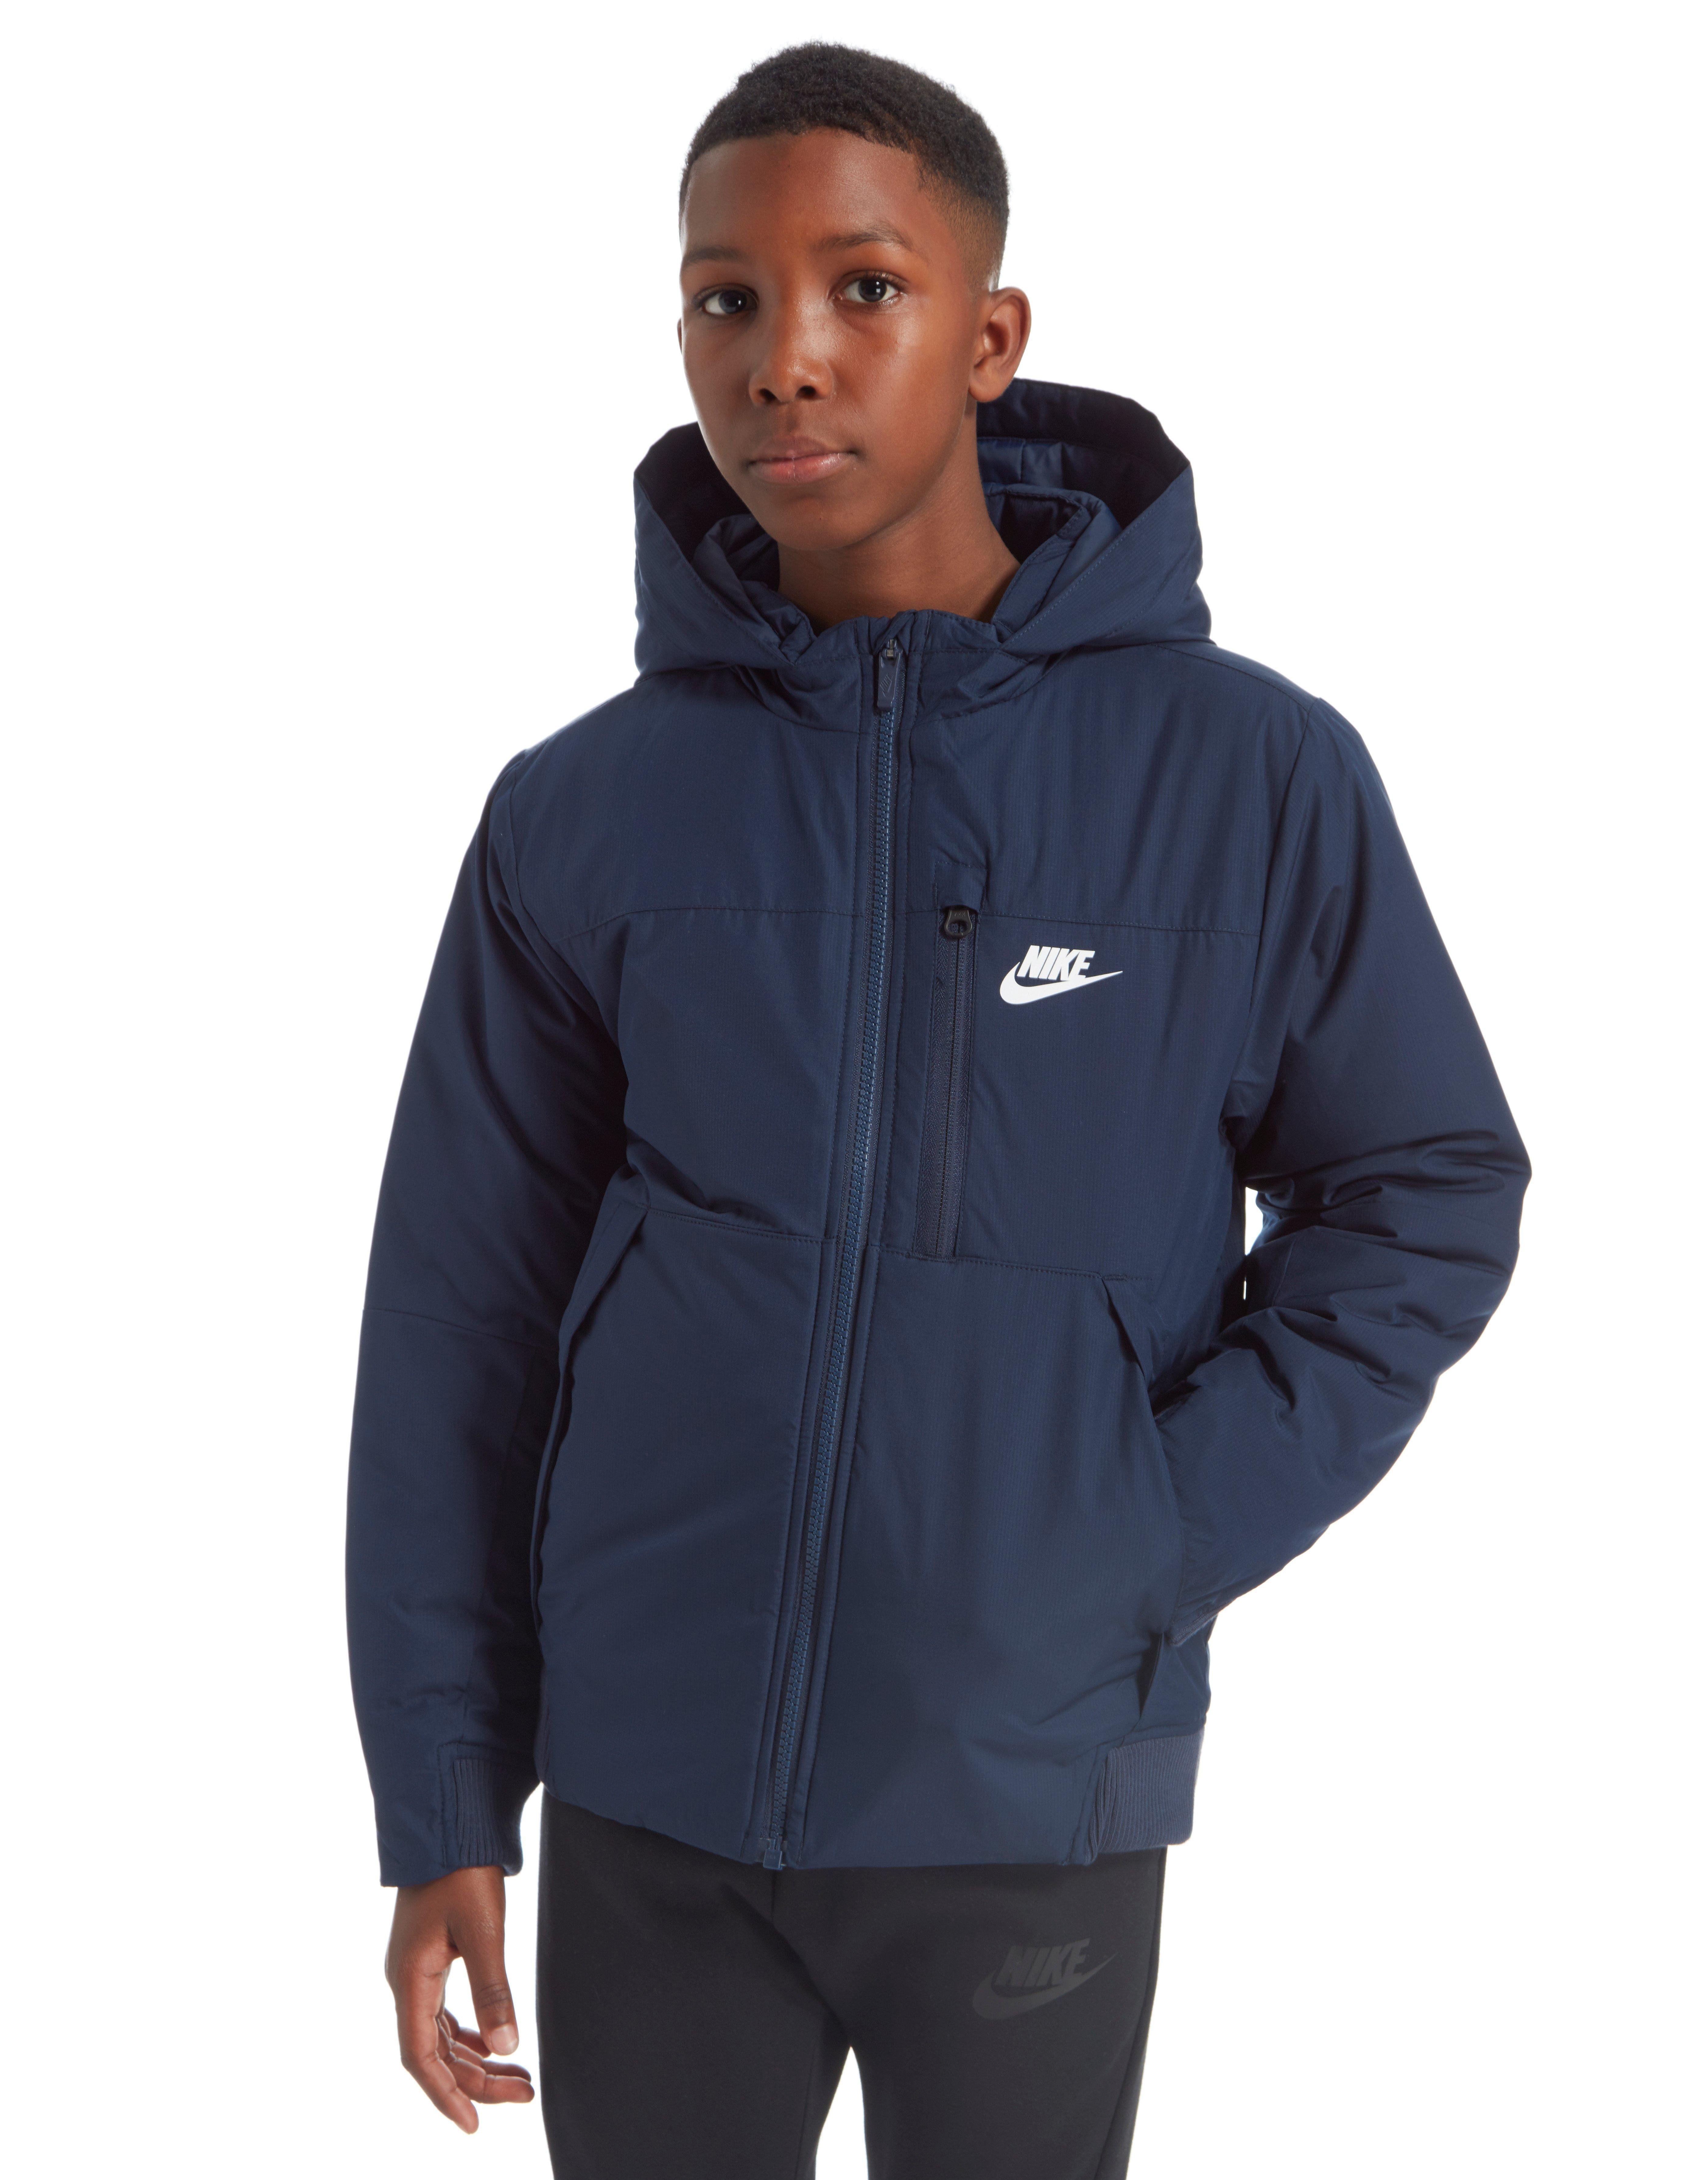 Nike Core Padded Jacket Junior Jd Sports